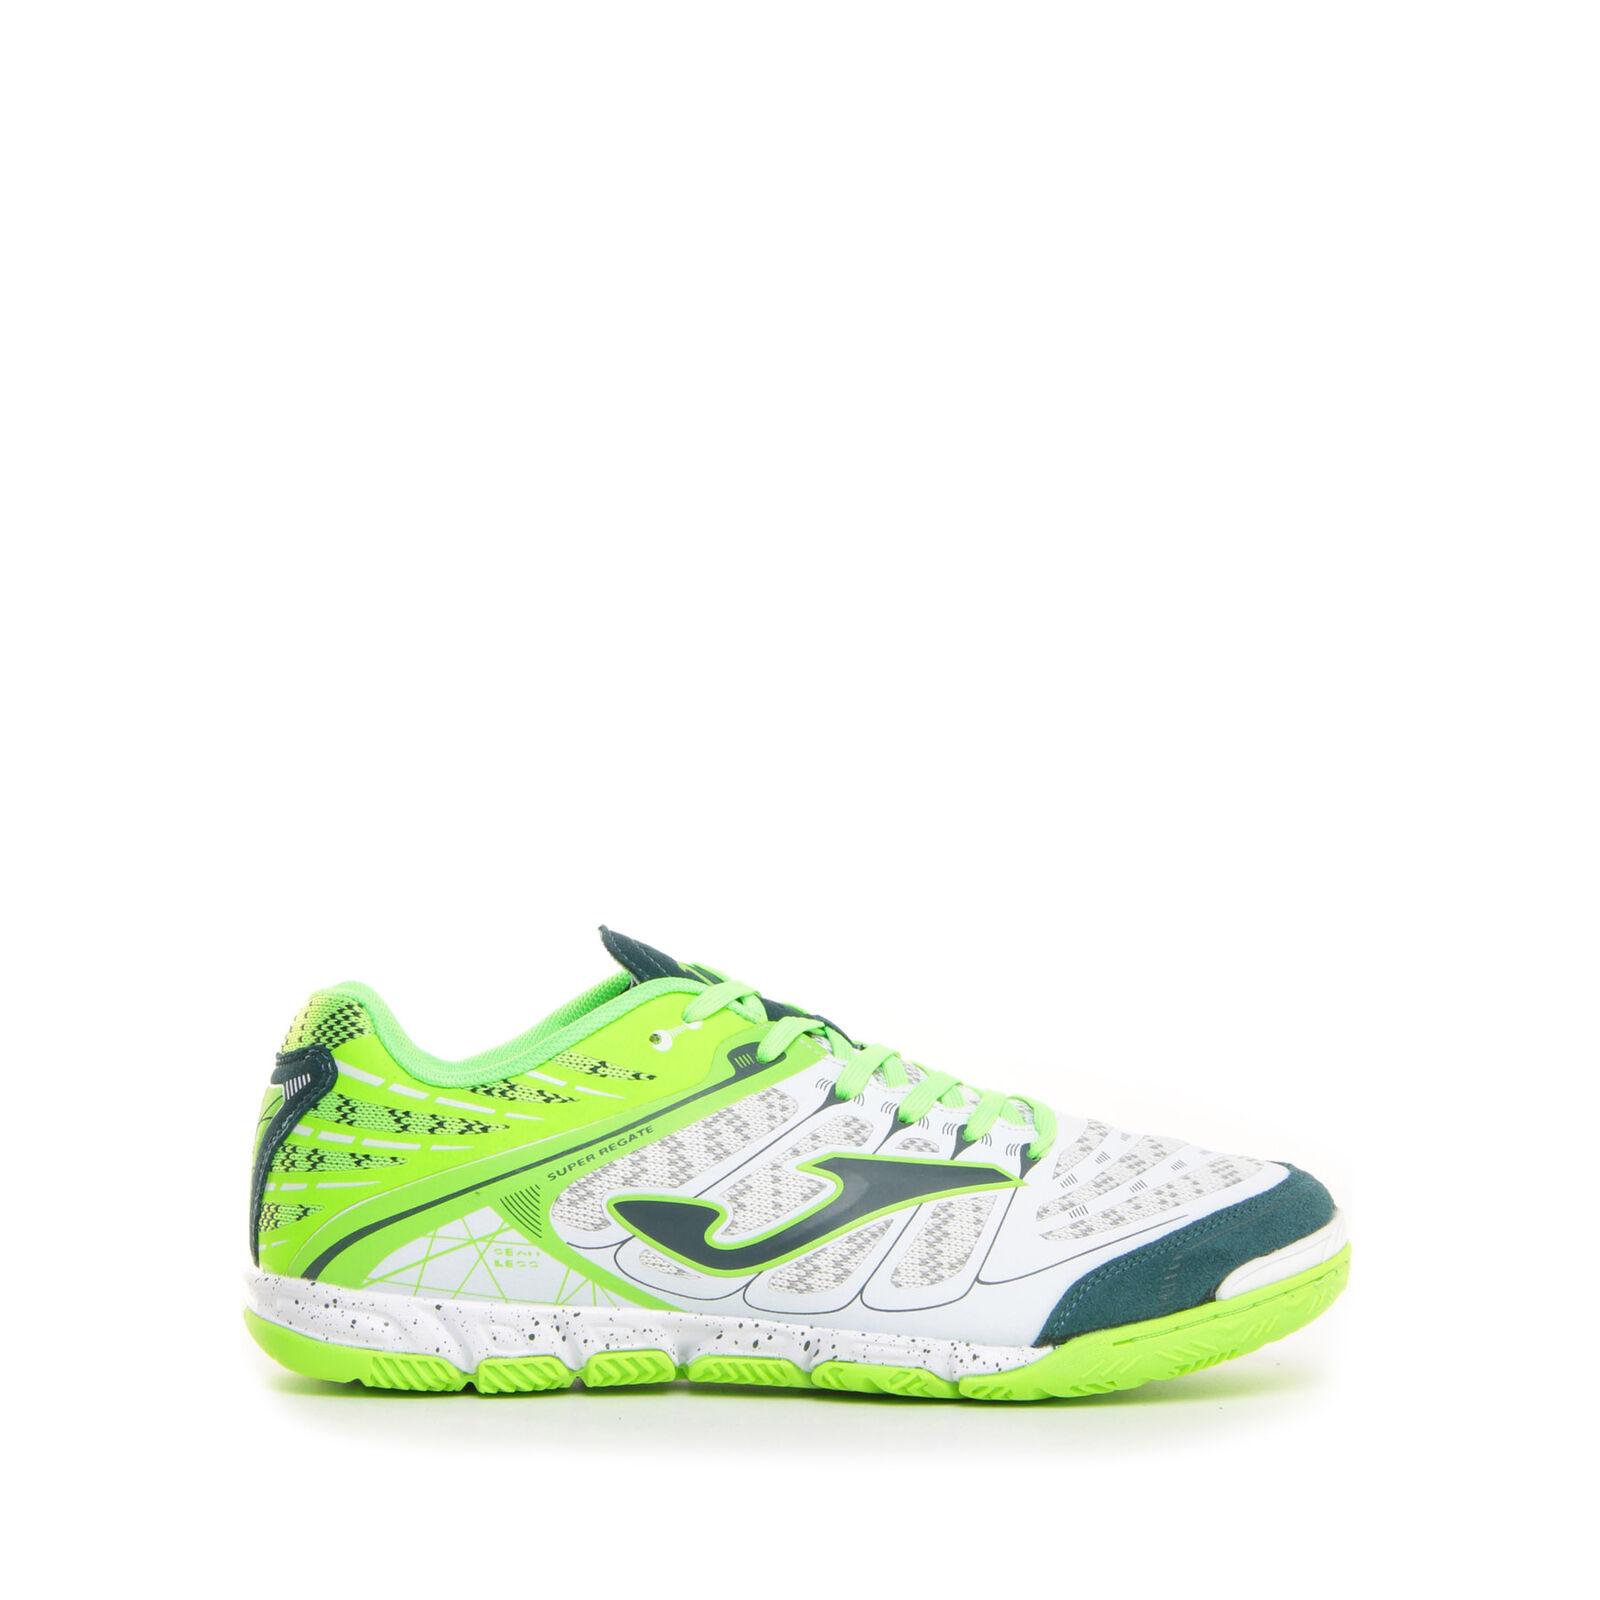 JOMA SUPER REGATE INDOOR shoes CALCIO A 5 INDOOR SREGW 832 IN